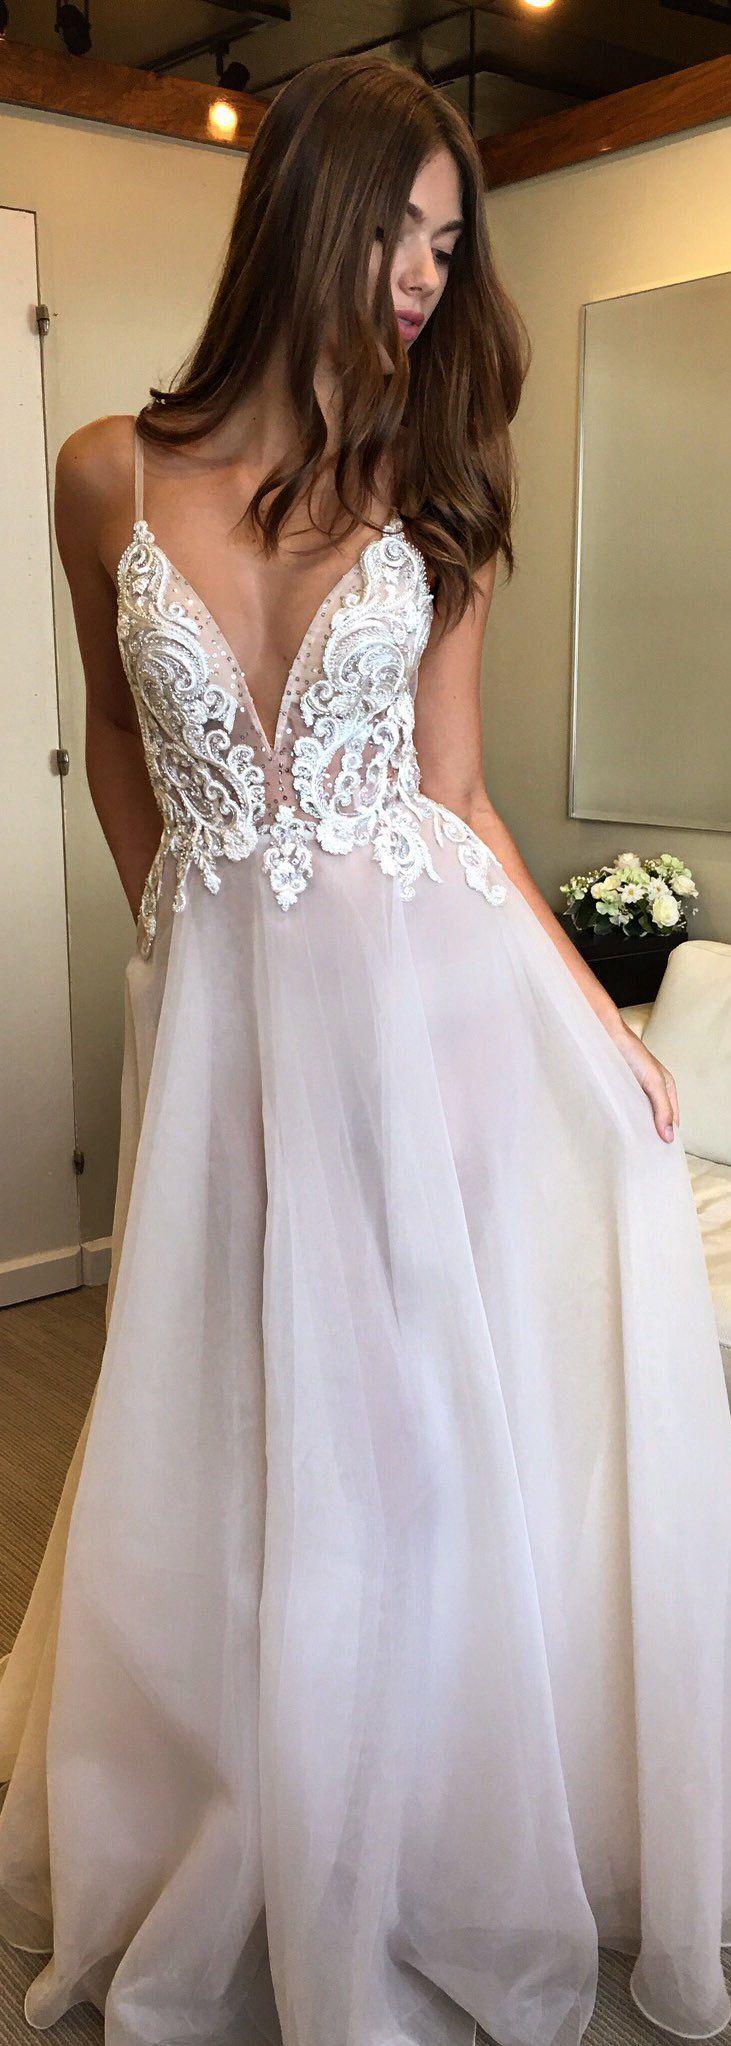 Muse by BERTA bridal sleeveless lace romantic a line wedding dress chapel train -Muse by BERTA Wedding Dresses | @bertabridal